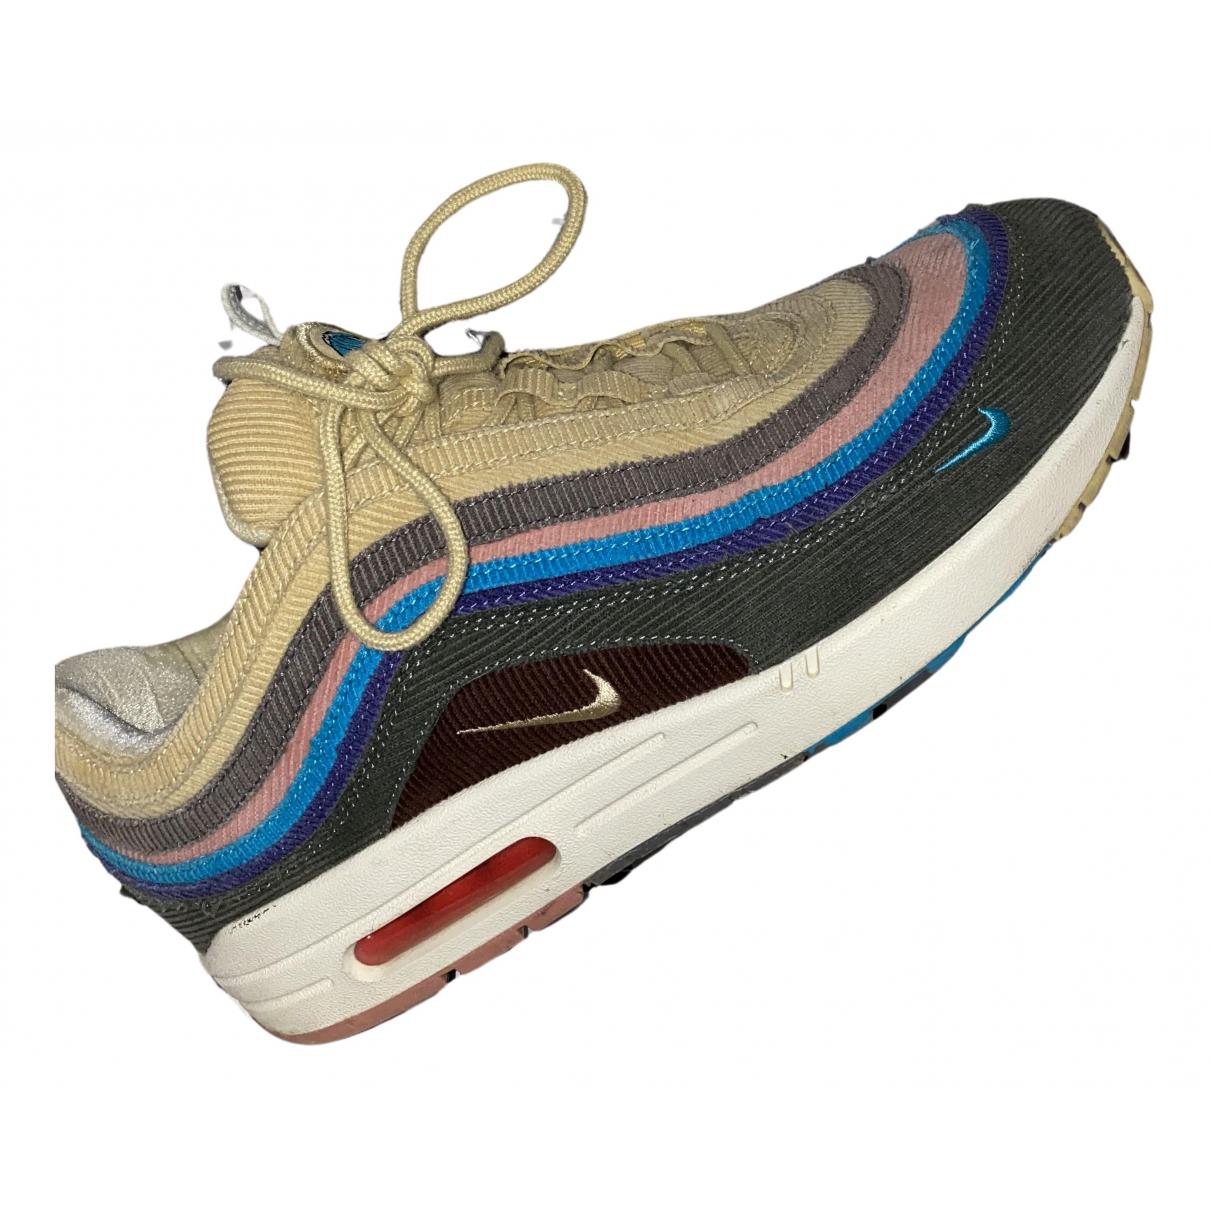 Nike Air Max 1/97 Sean Wotherspoon Sneakers in  Bunt Leinen